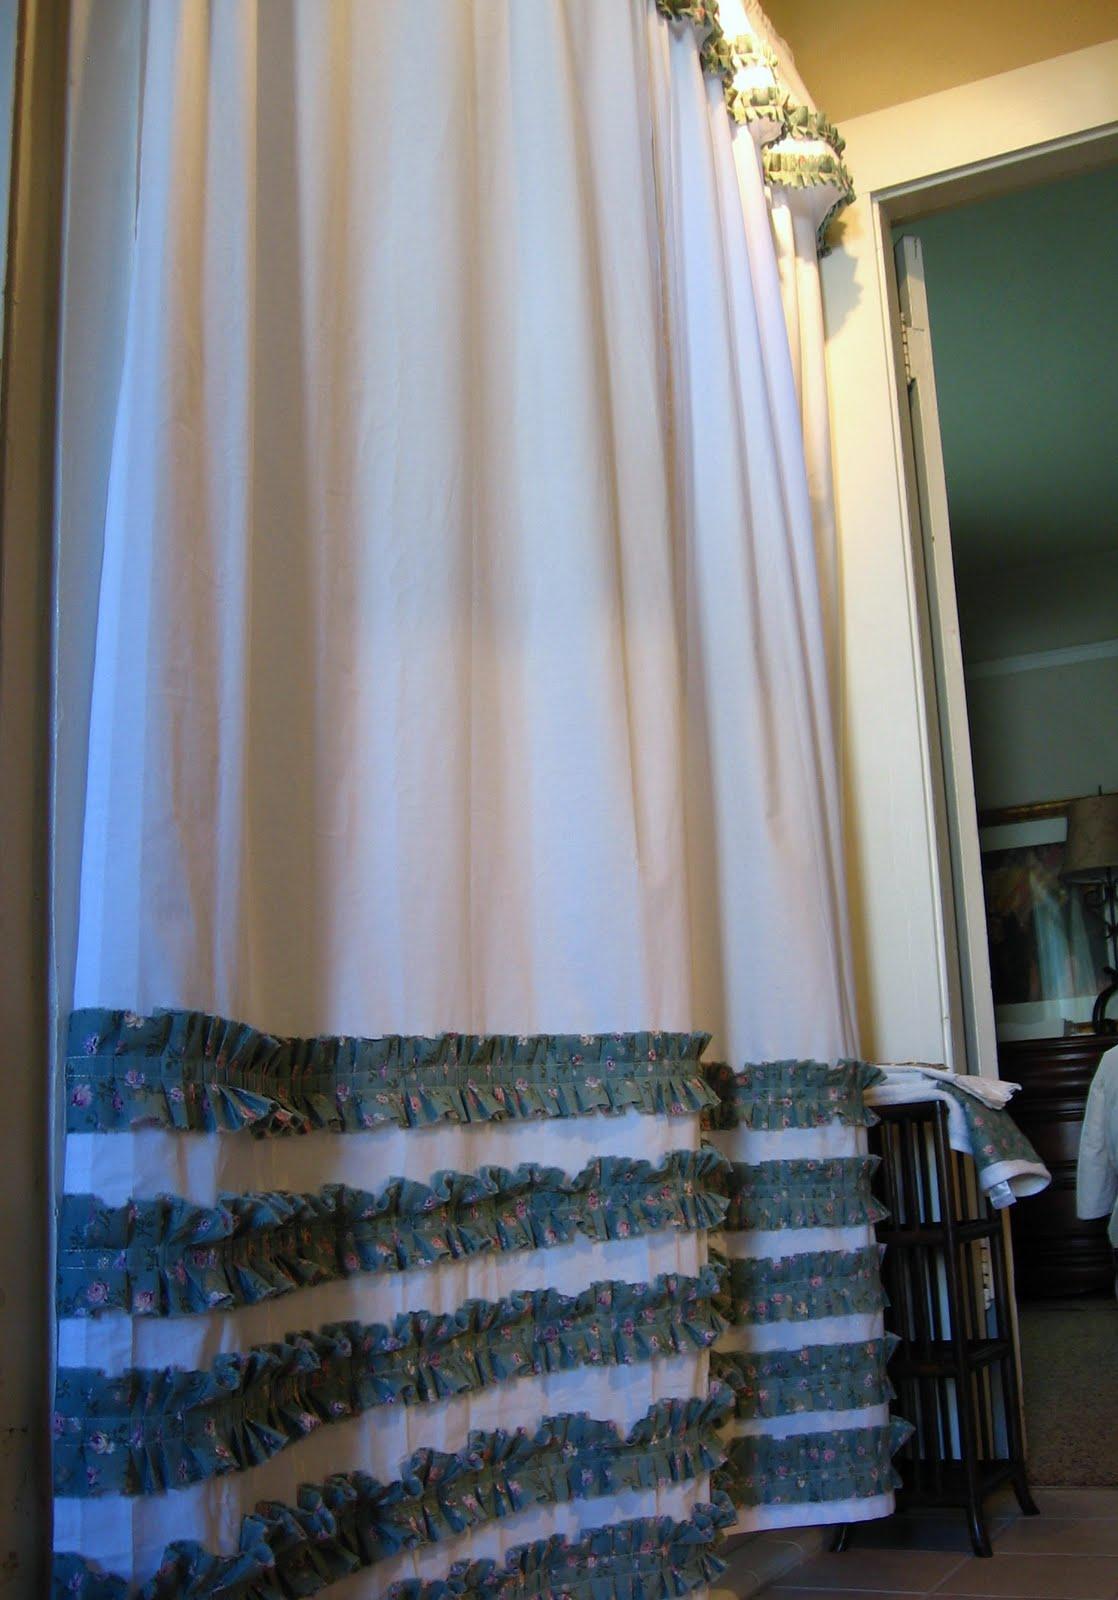 Diy ruffled shower curtain - Diy Ruffled Shower Curtain